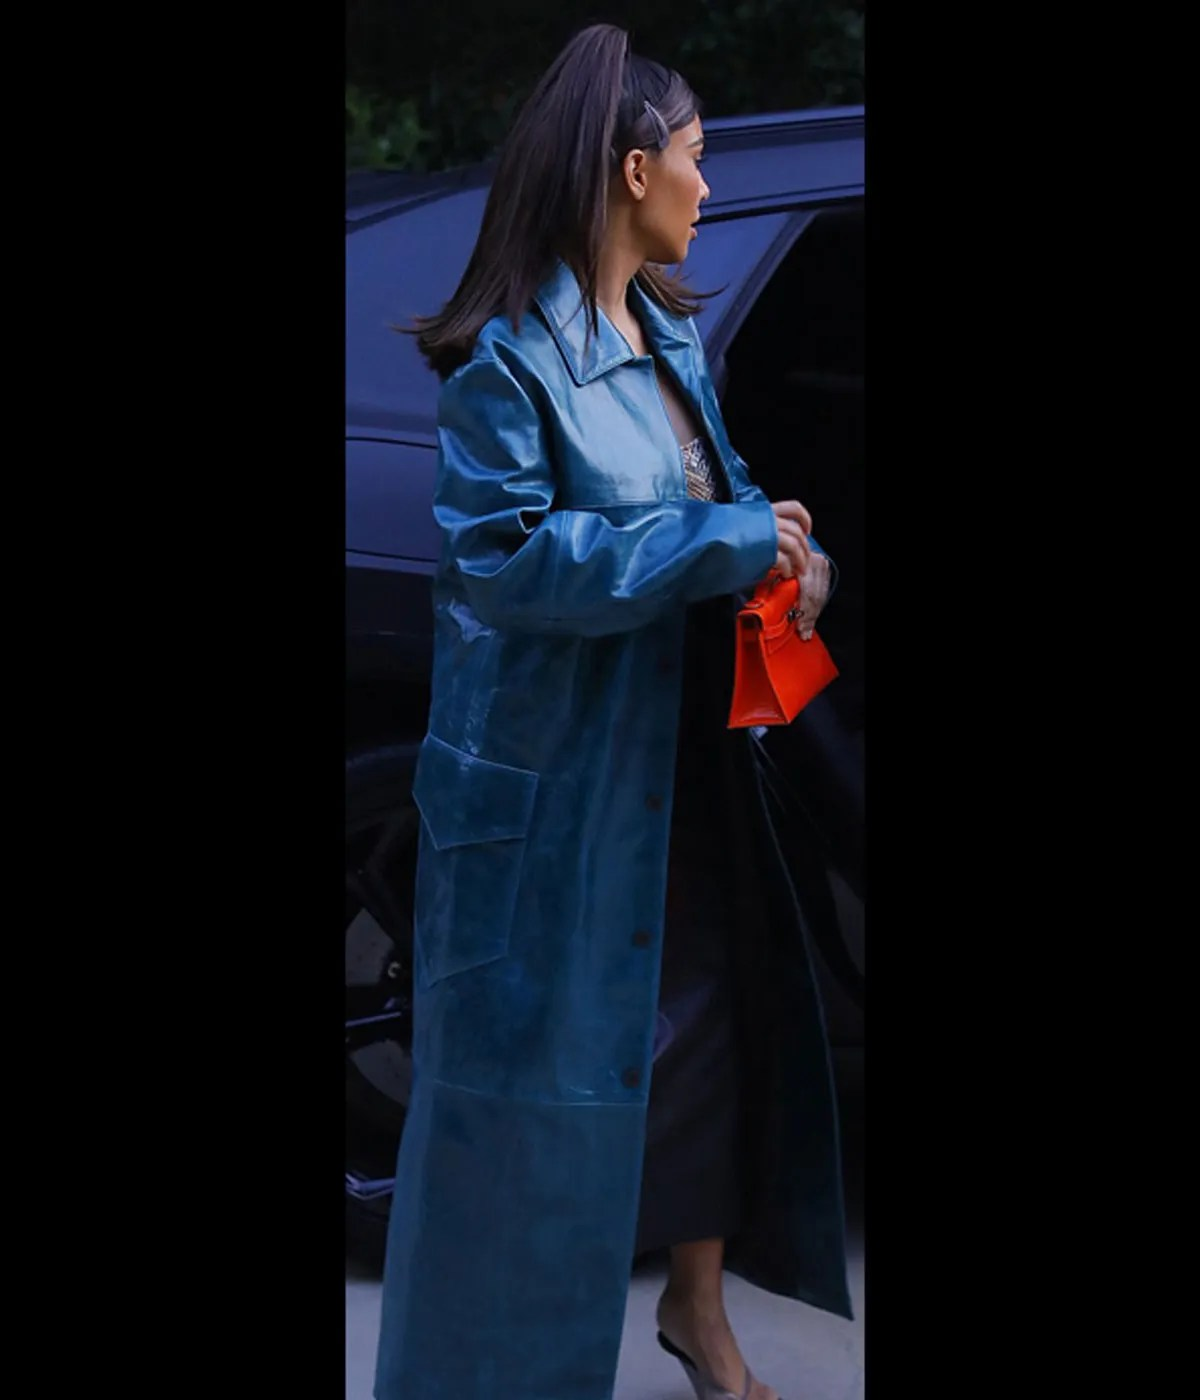 street-style-kim-kardashian-blue-coat